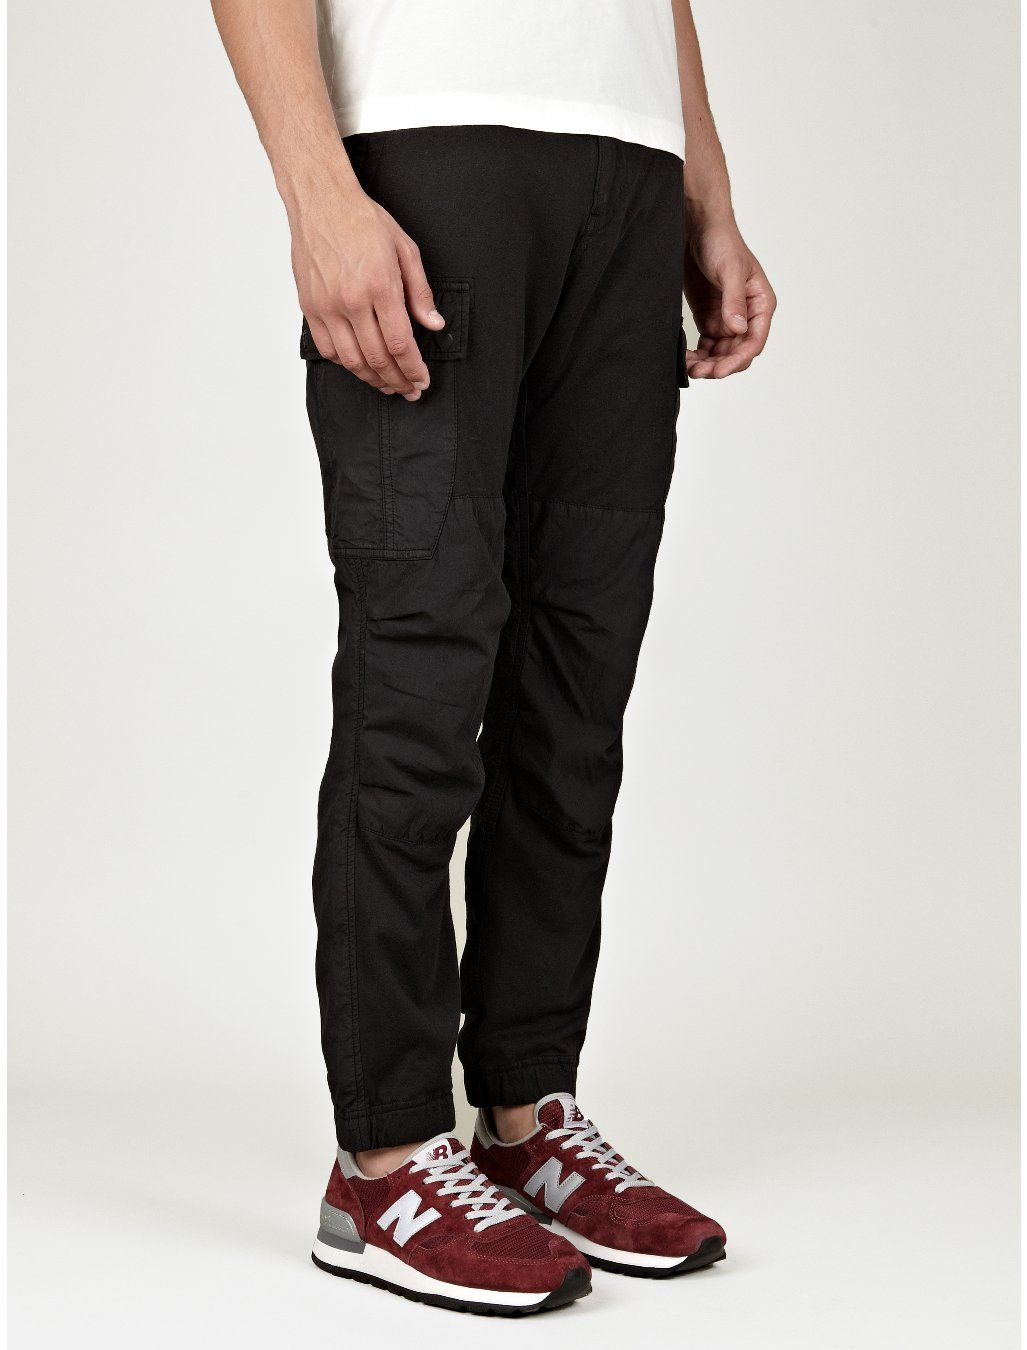 Stone Island Men's Black Cargo Pants | oki-ni | Black ...